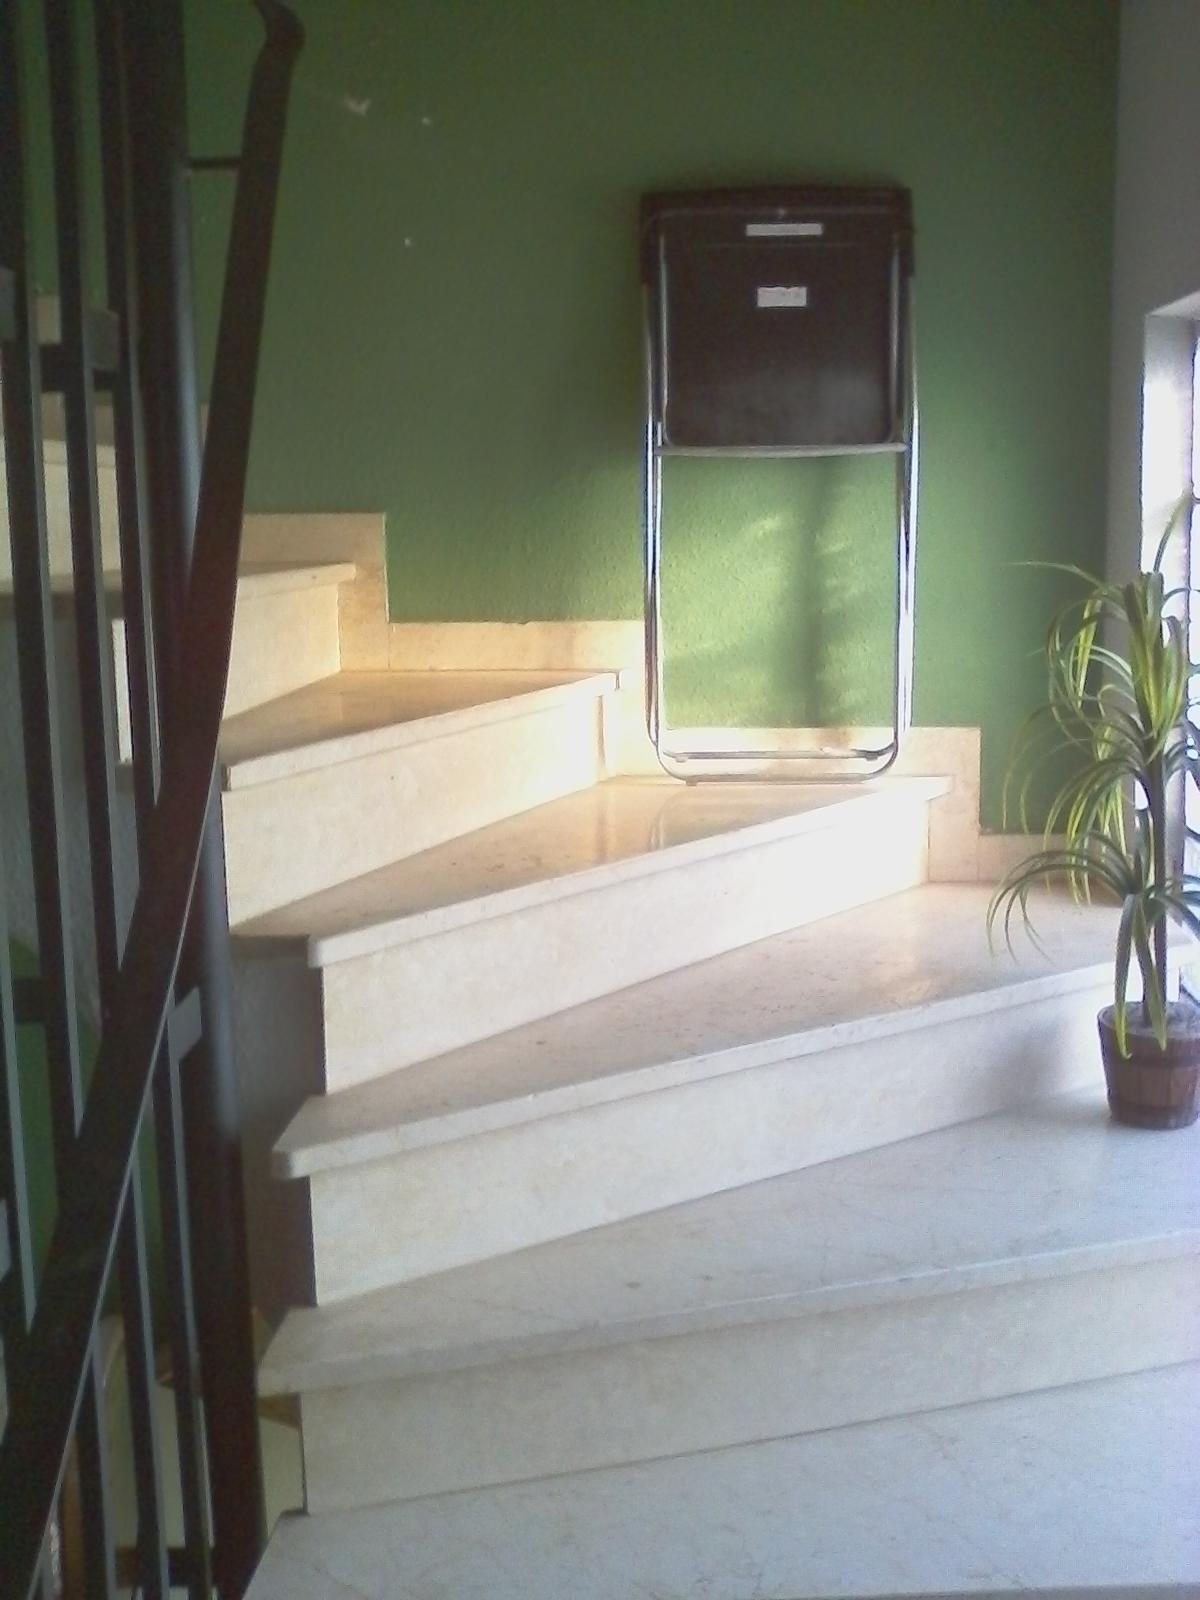 g nstige monteurzimmer bad camberg monteurwohnung mit internet unterk nfte. Black Bedroom Furniture Sets. Home Design Ideas